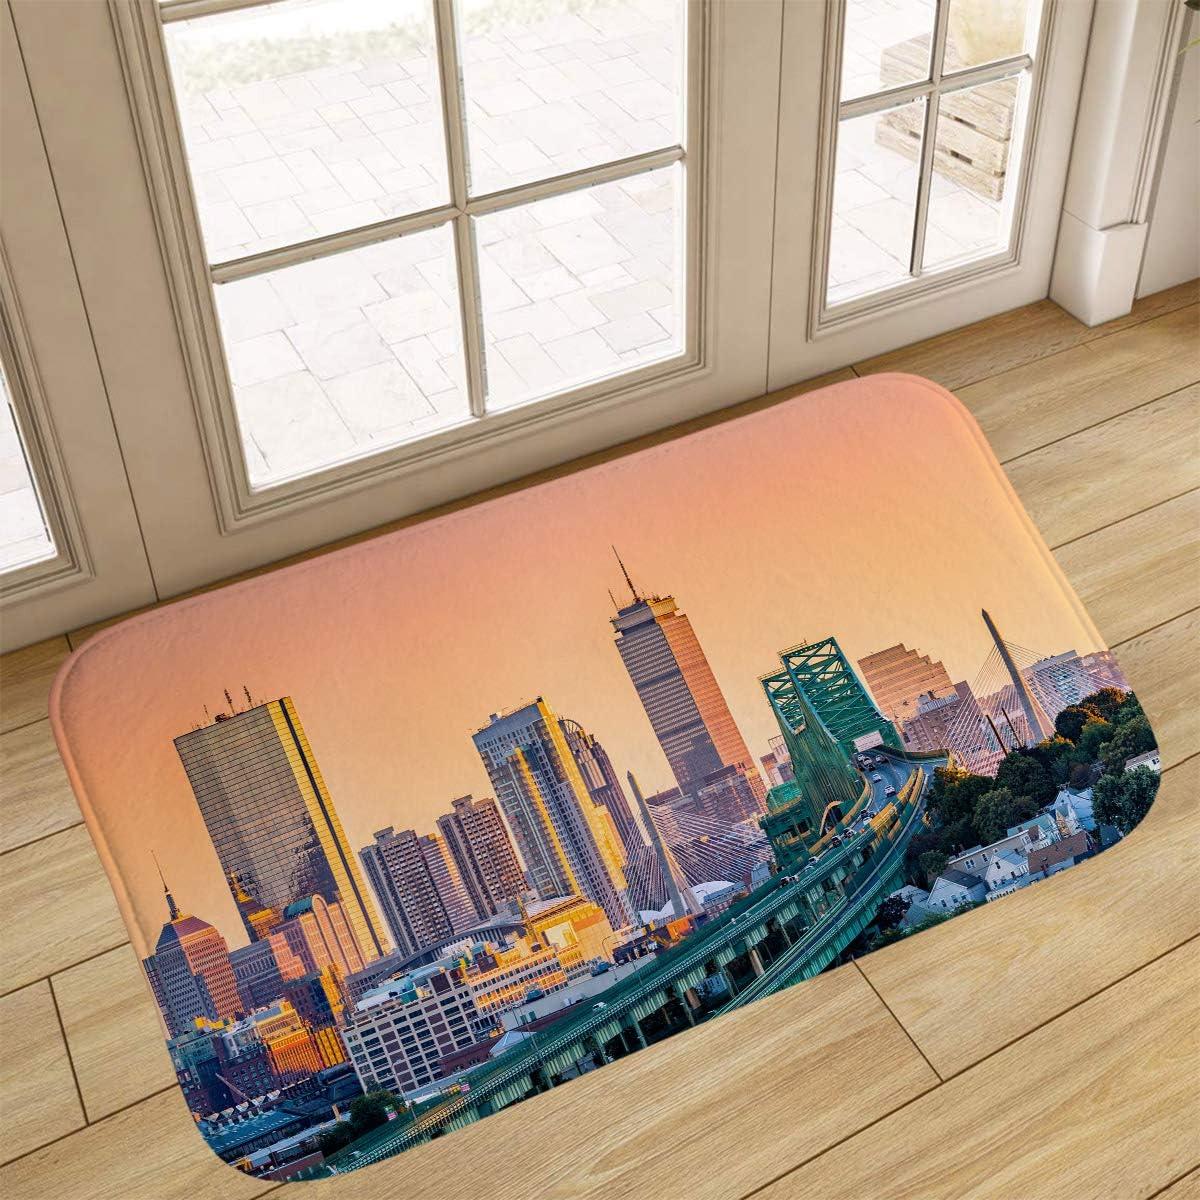 Y Heathfit Sunset Bathroom Rugs, Doormat,Tobin Bridge, Zakim Bridge and Skyline Panorama at Sunset,Home Decor Floor Carpet Bath Mat,18x47 in